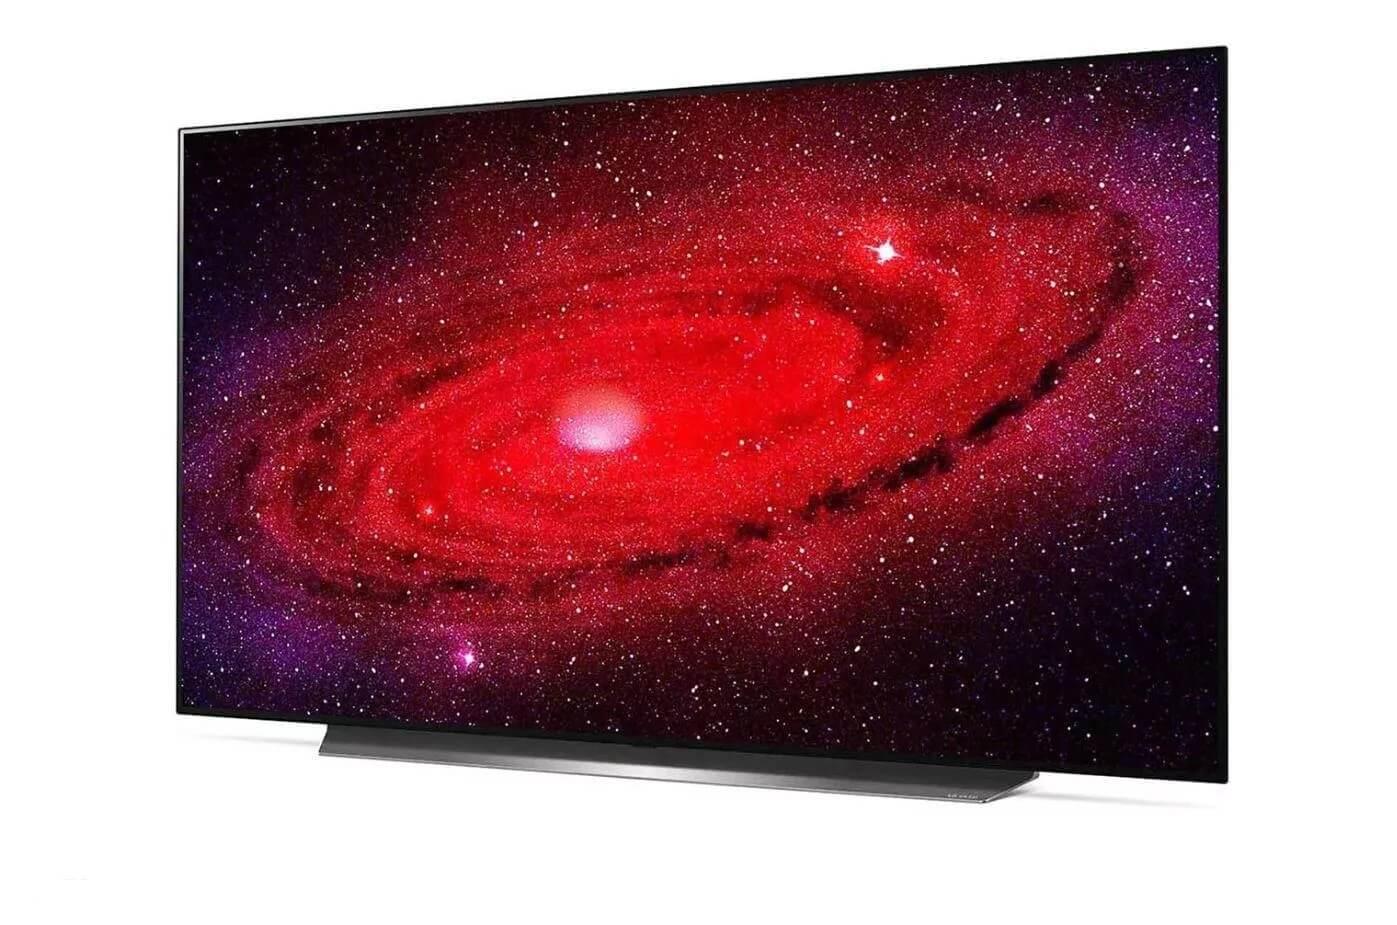 LG OLED 4K Smart TV 77